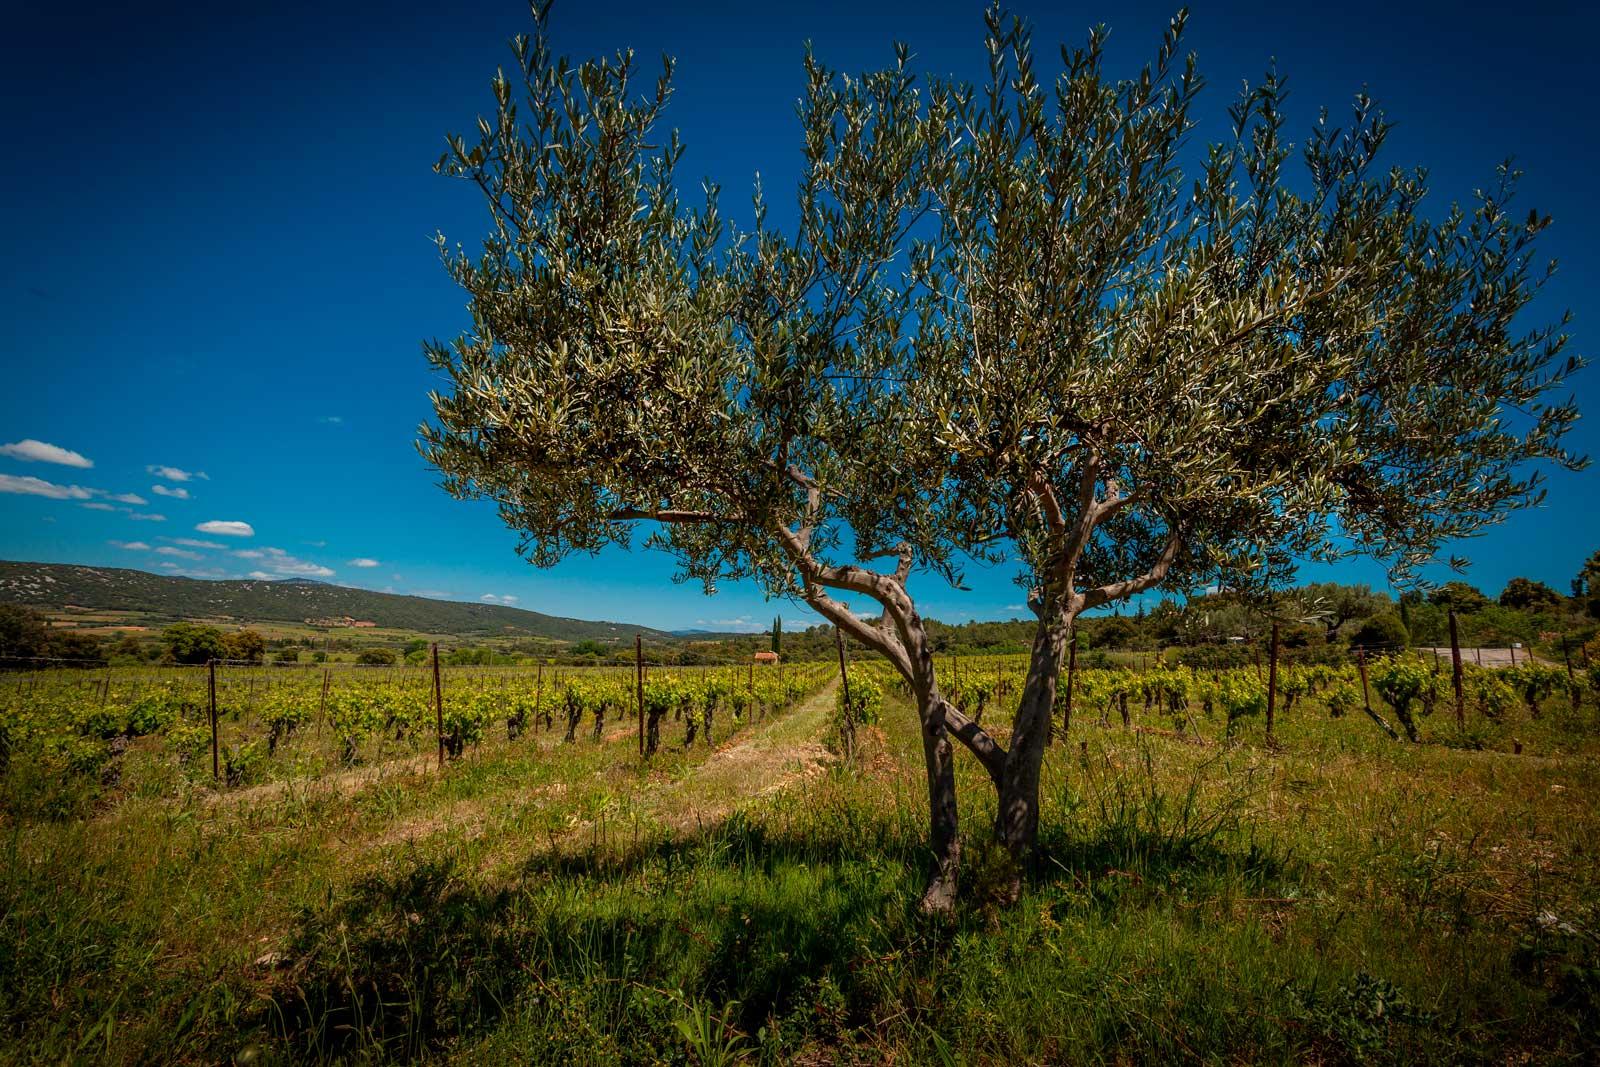 mas-seranne-vin-vente-domaine-degustation-caves-bio-languedoc_Venture_photo_Petiot_new1b